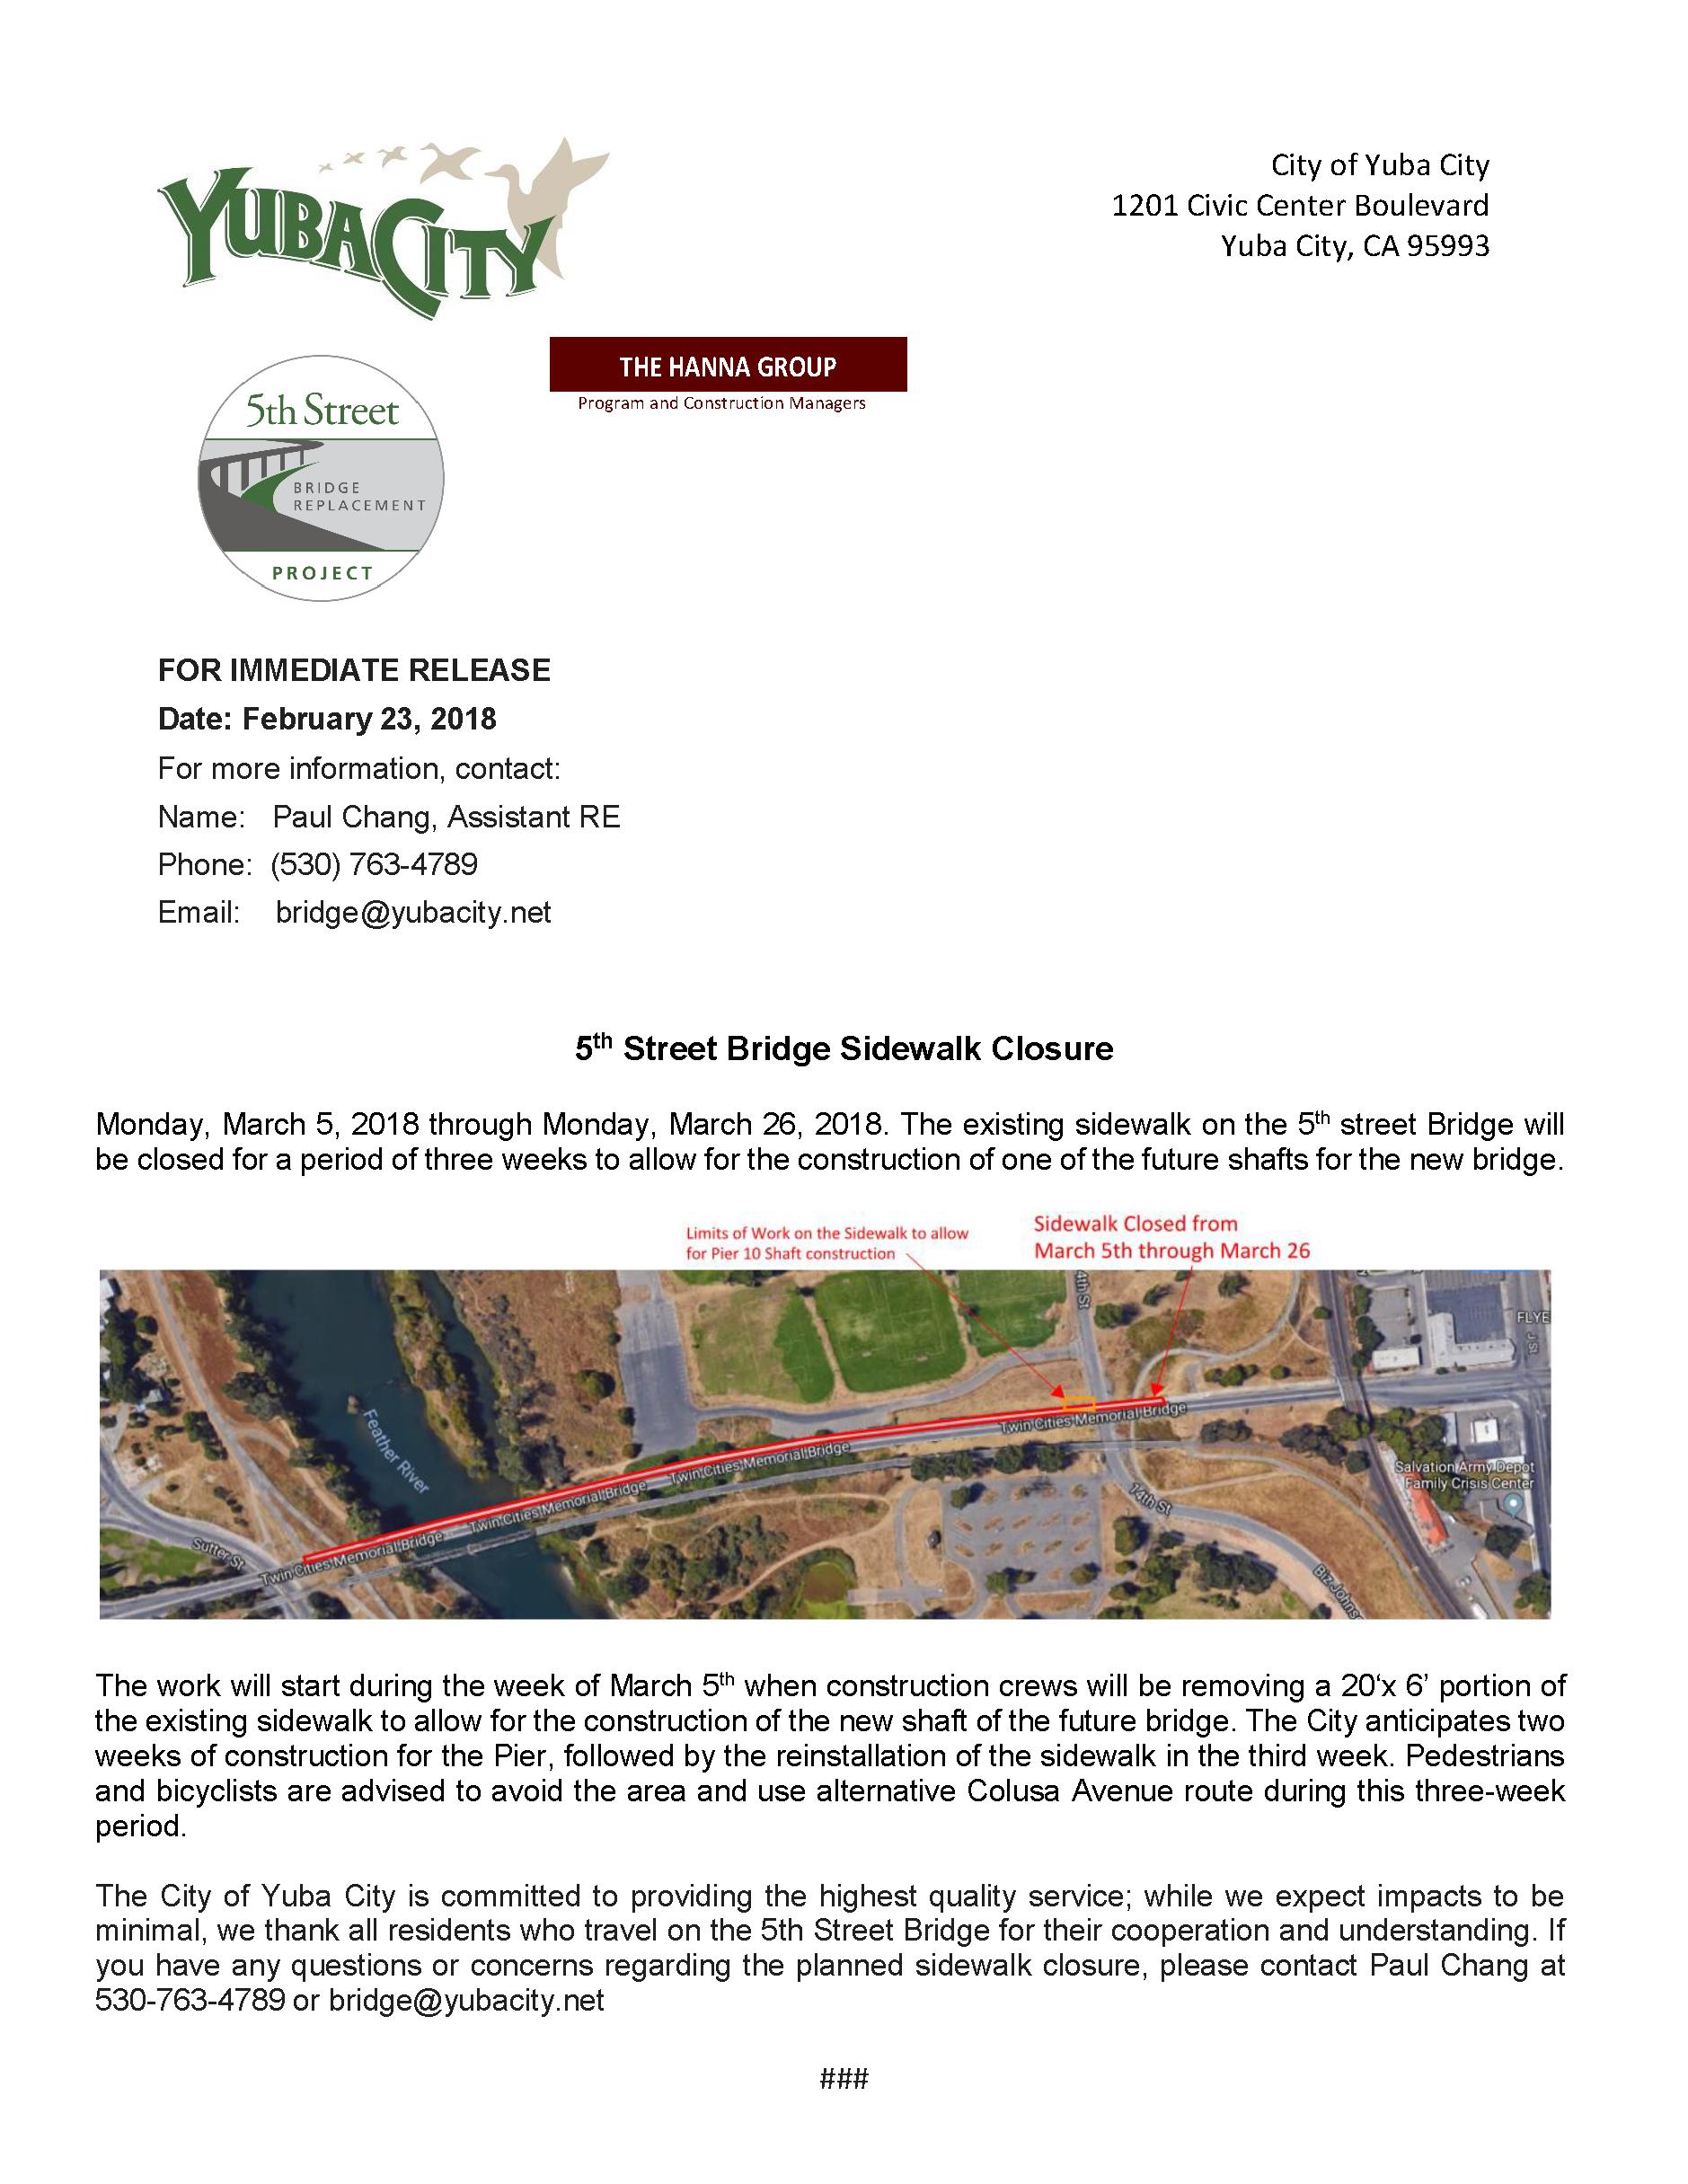 Press Release - 5th St Bridge Sidewalk Closure 2-23-18.png